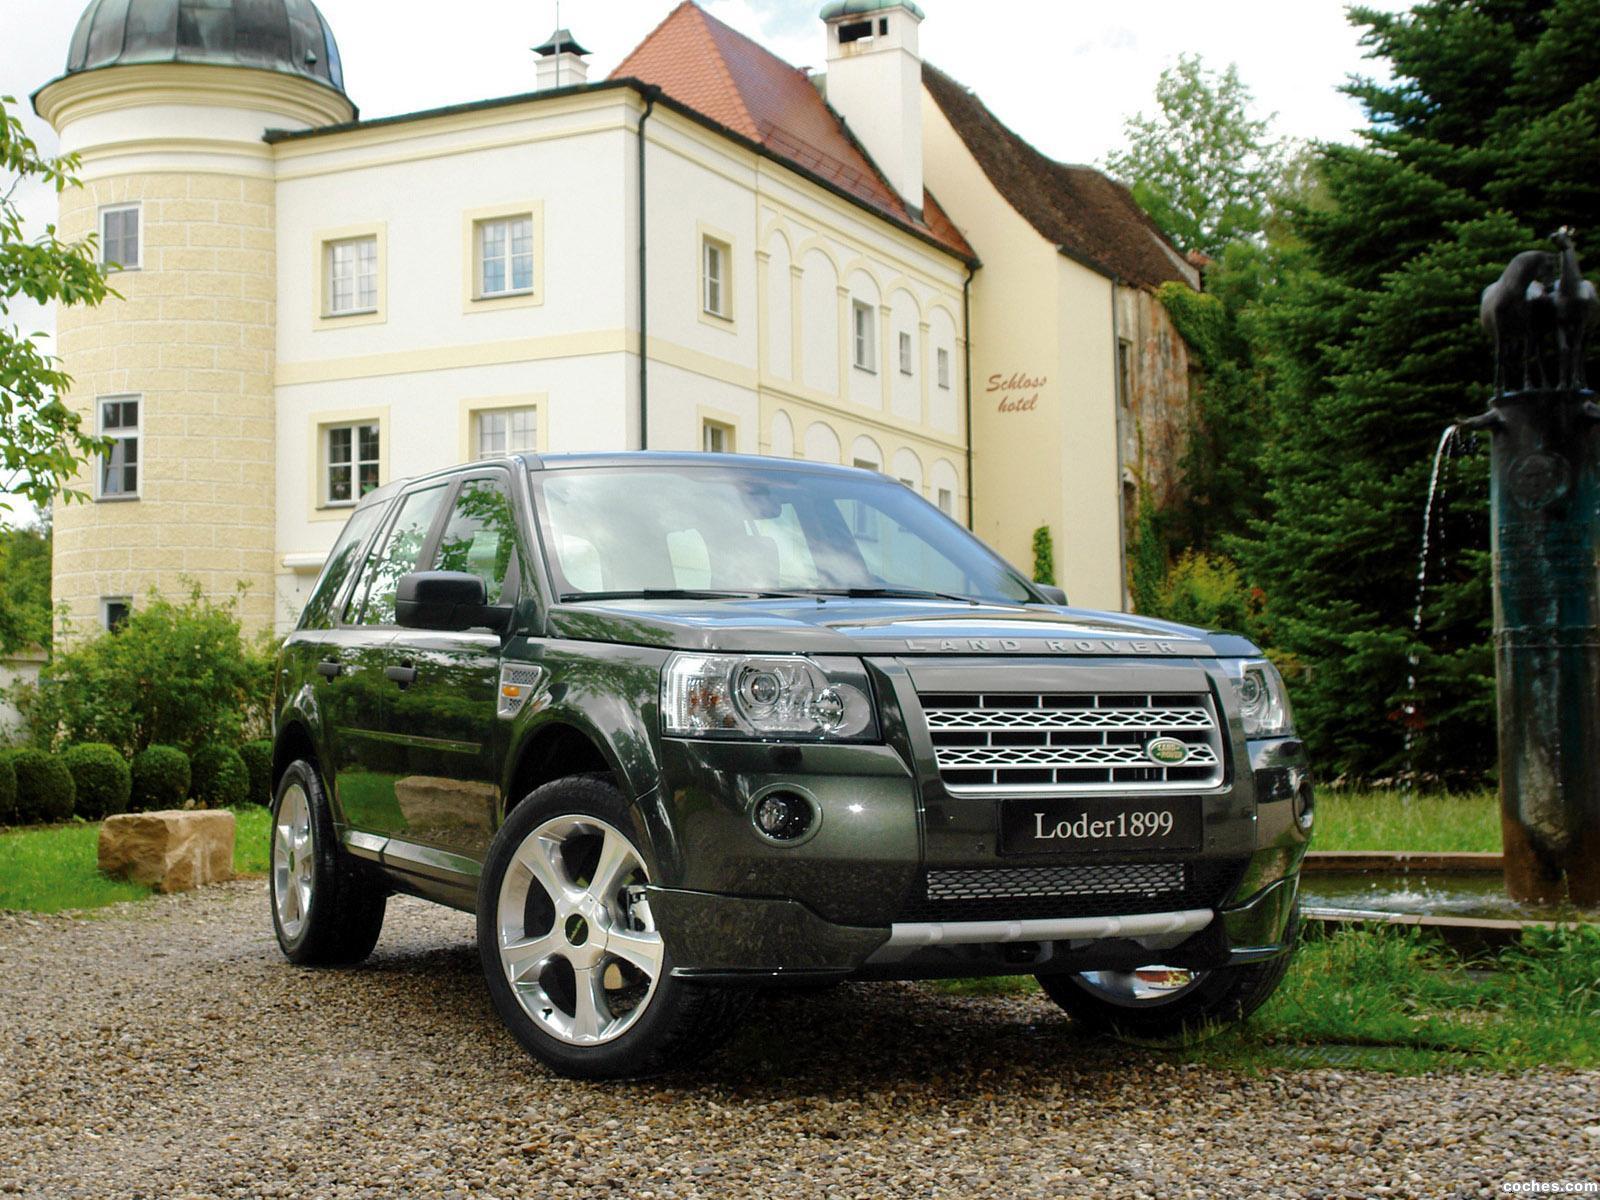 Foto 0 de Loder1899 Land Rover Freelander 2007